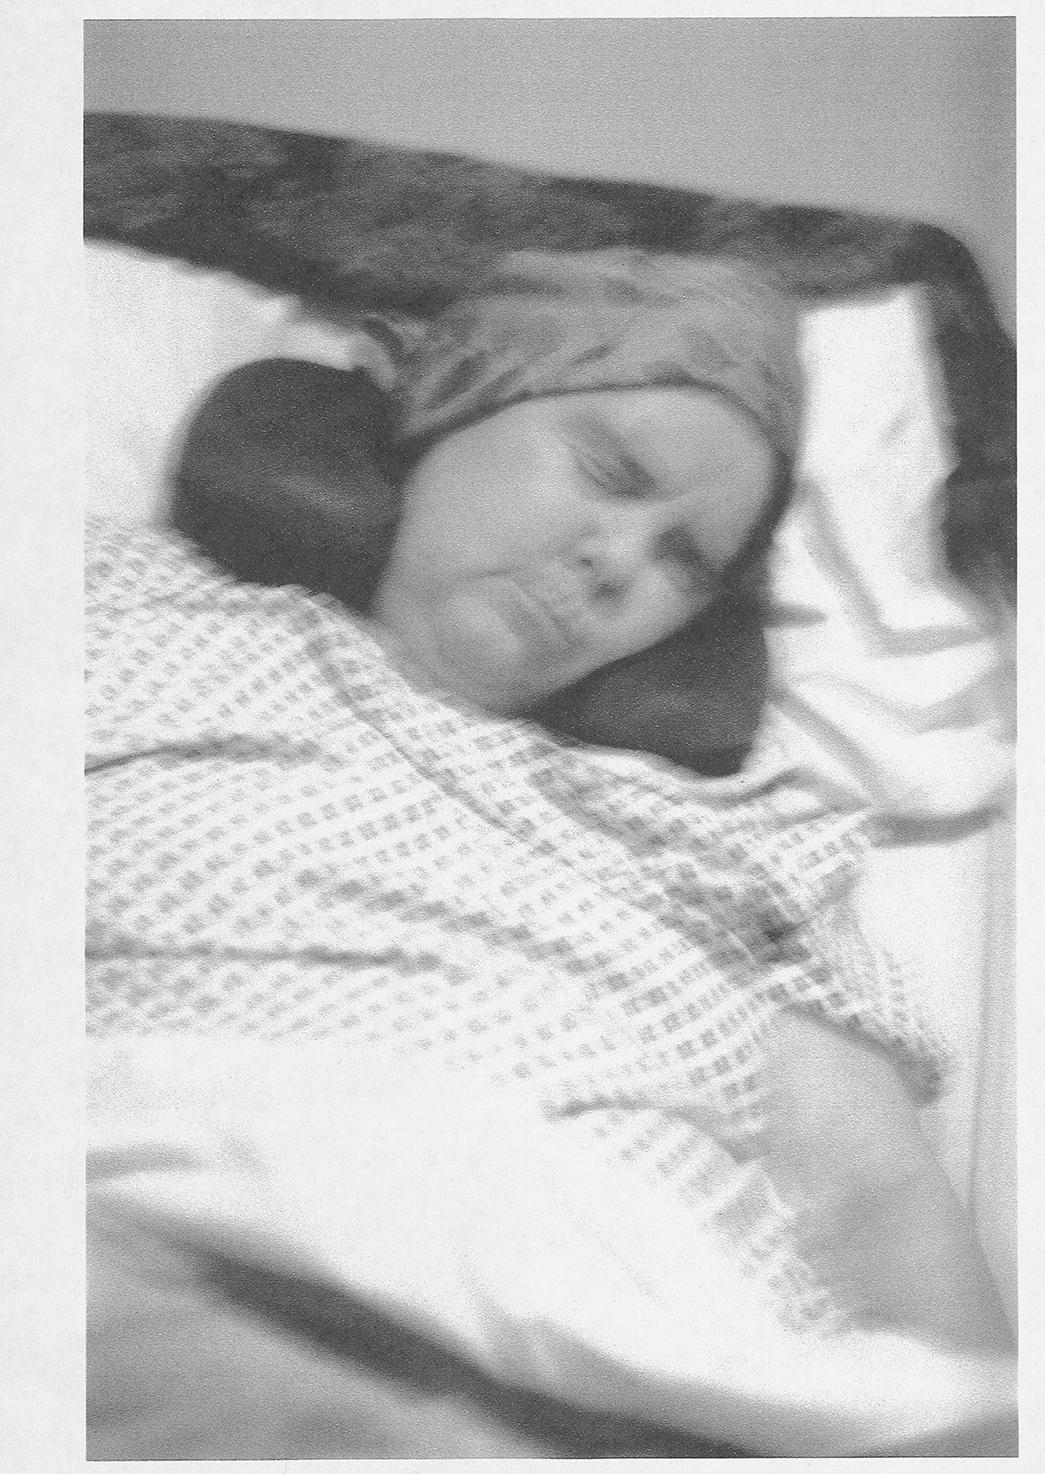 Mum Dying, laserjet on paper